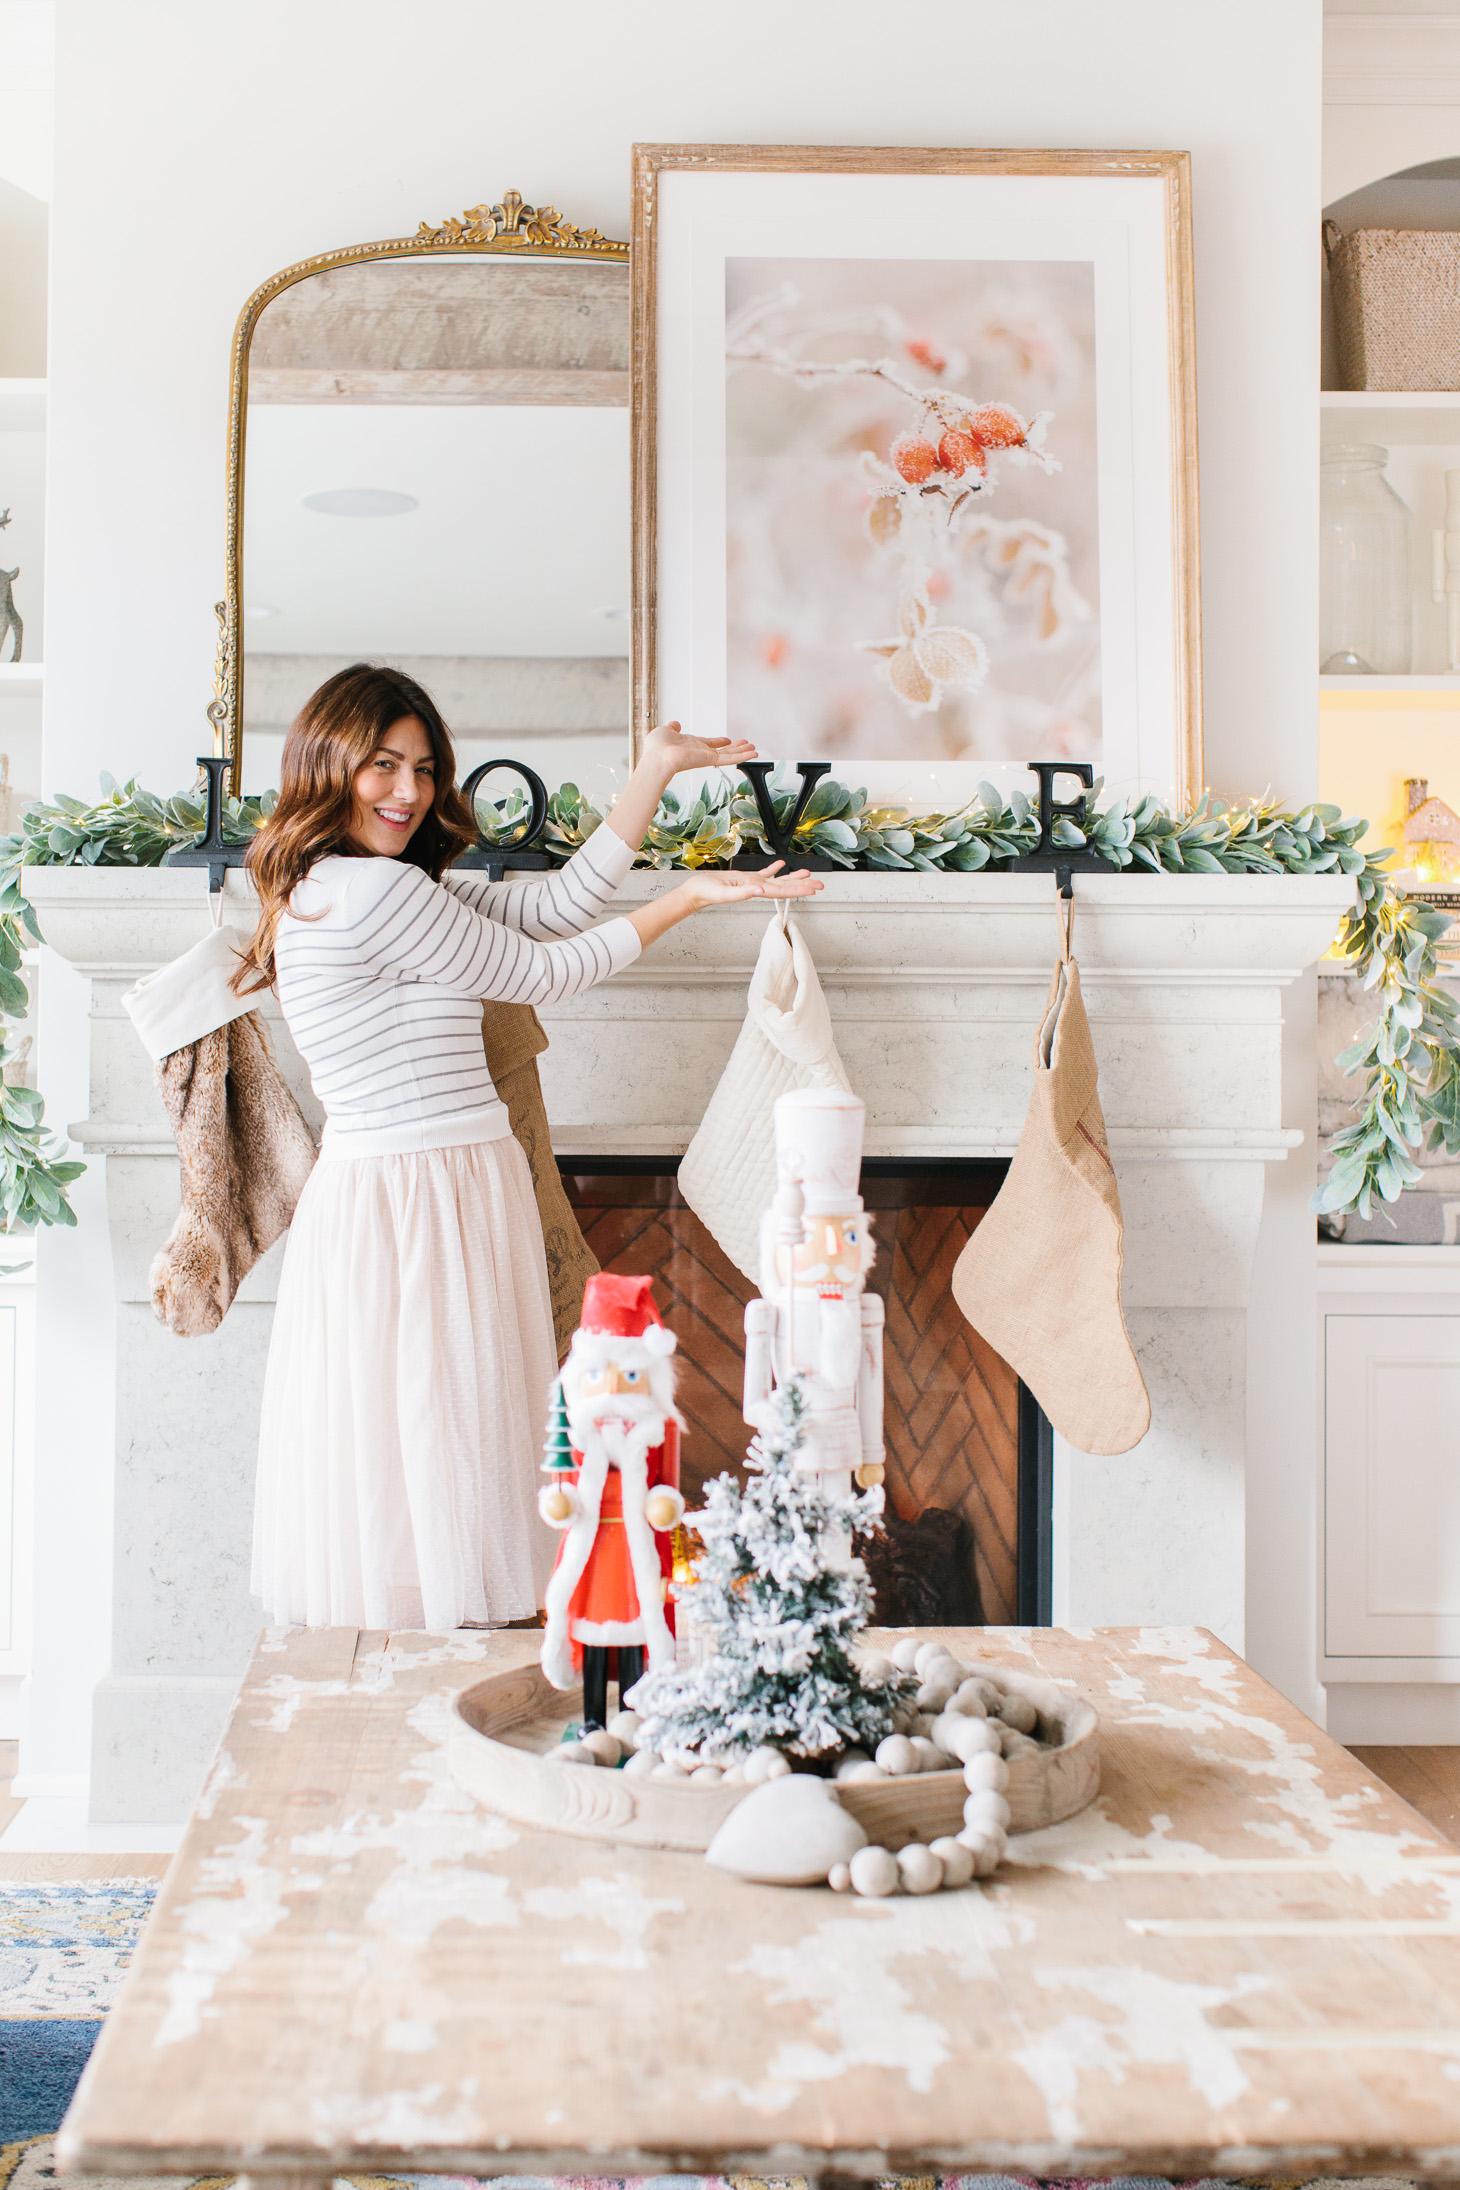 Jillian Harris 12 Days of Christmas Minted